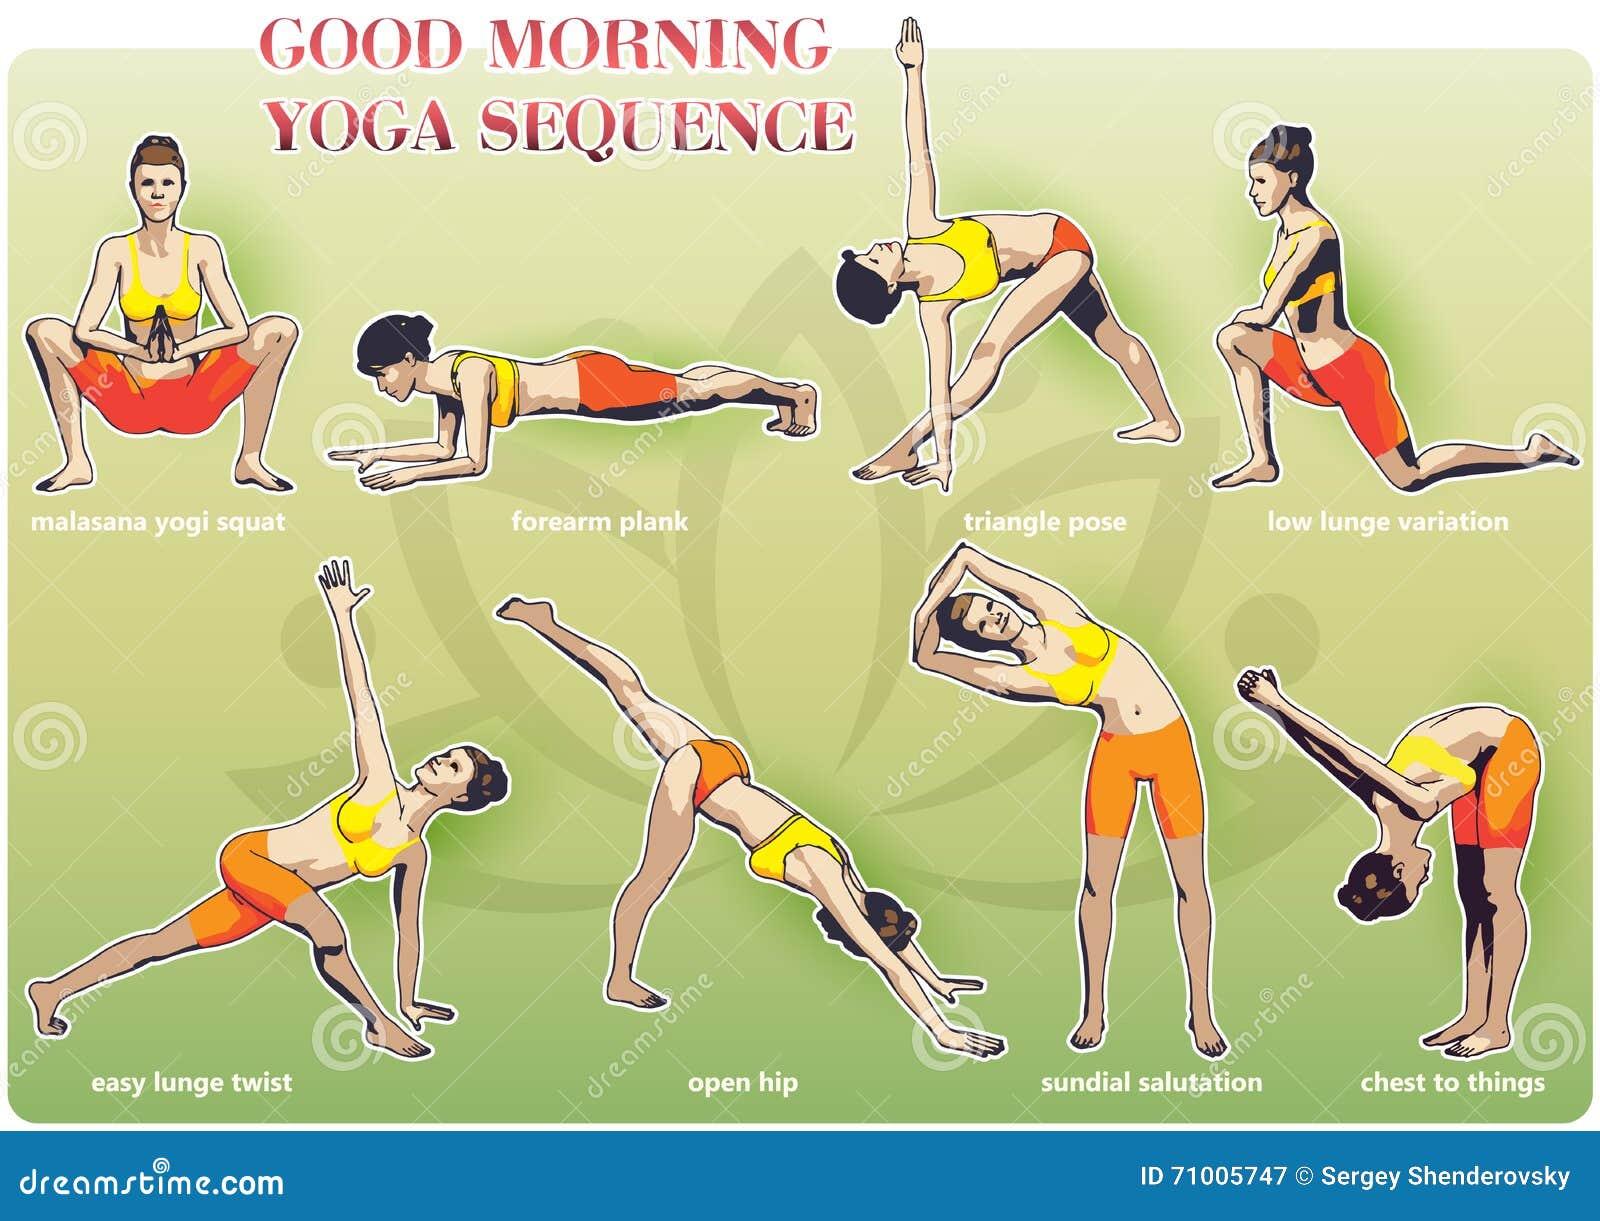 good morning yoga sequence stock vector image 71005747. Black Bedroom Furniture Sets. Home Design Ideas